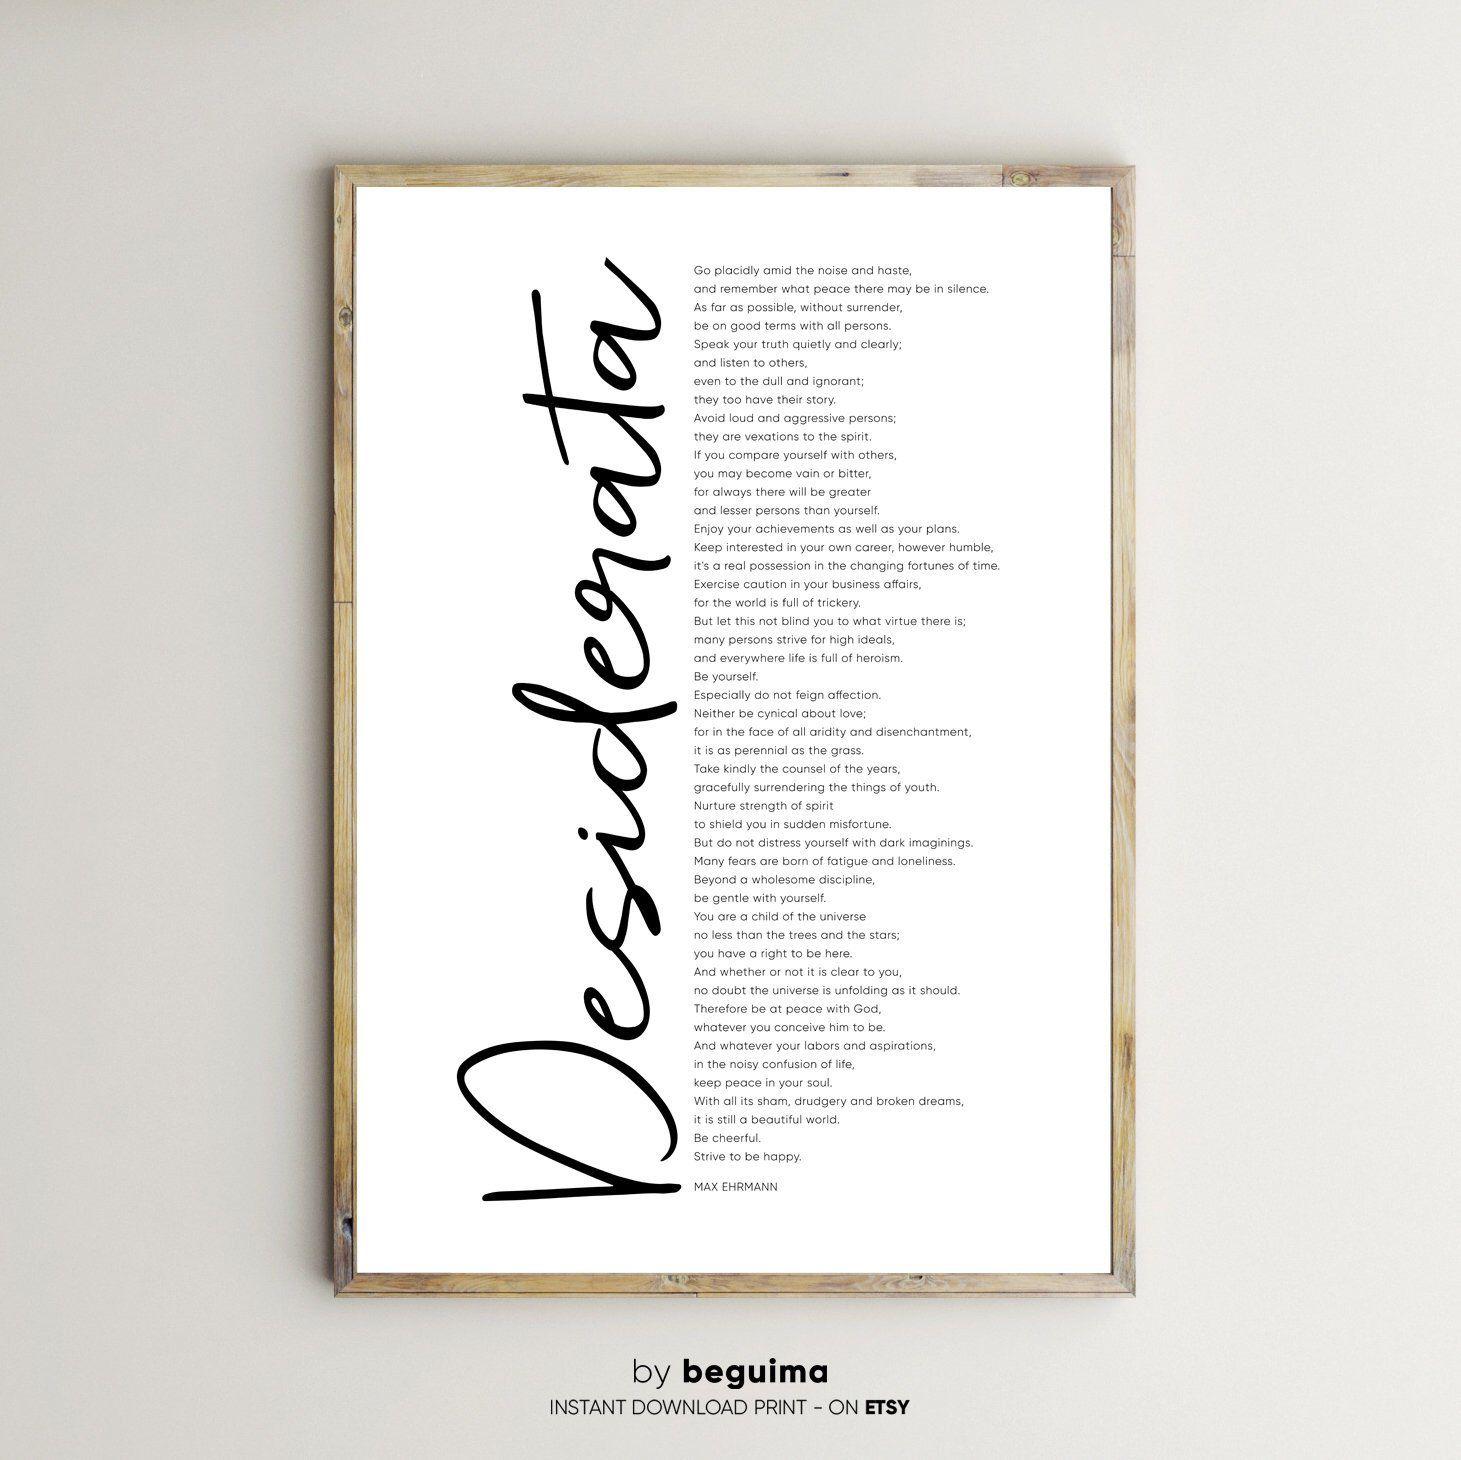 Desiderata Printsmax Ehrmann Poemprintable Wall Etsy Desiderata Max Ehrmann Inspirational Words